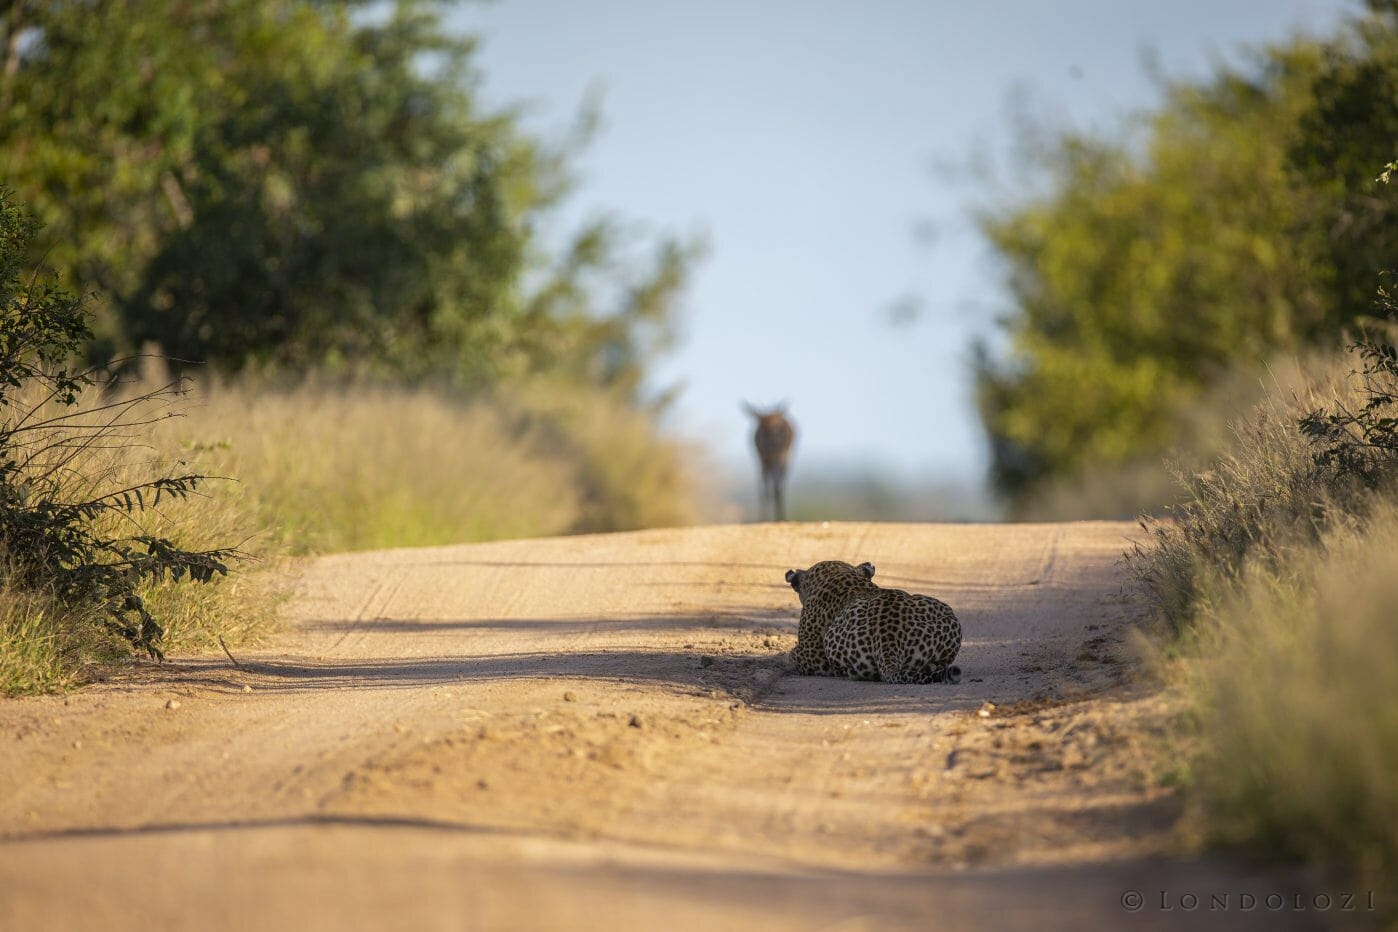 Leopard Senegal Stalk